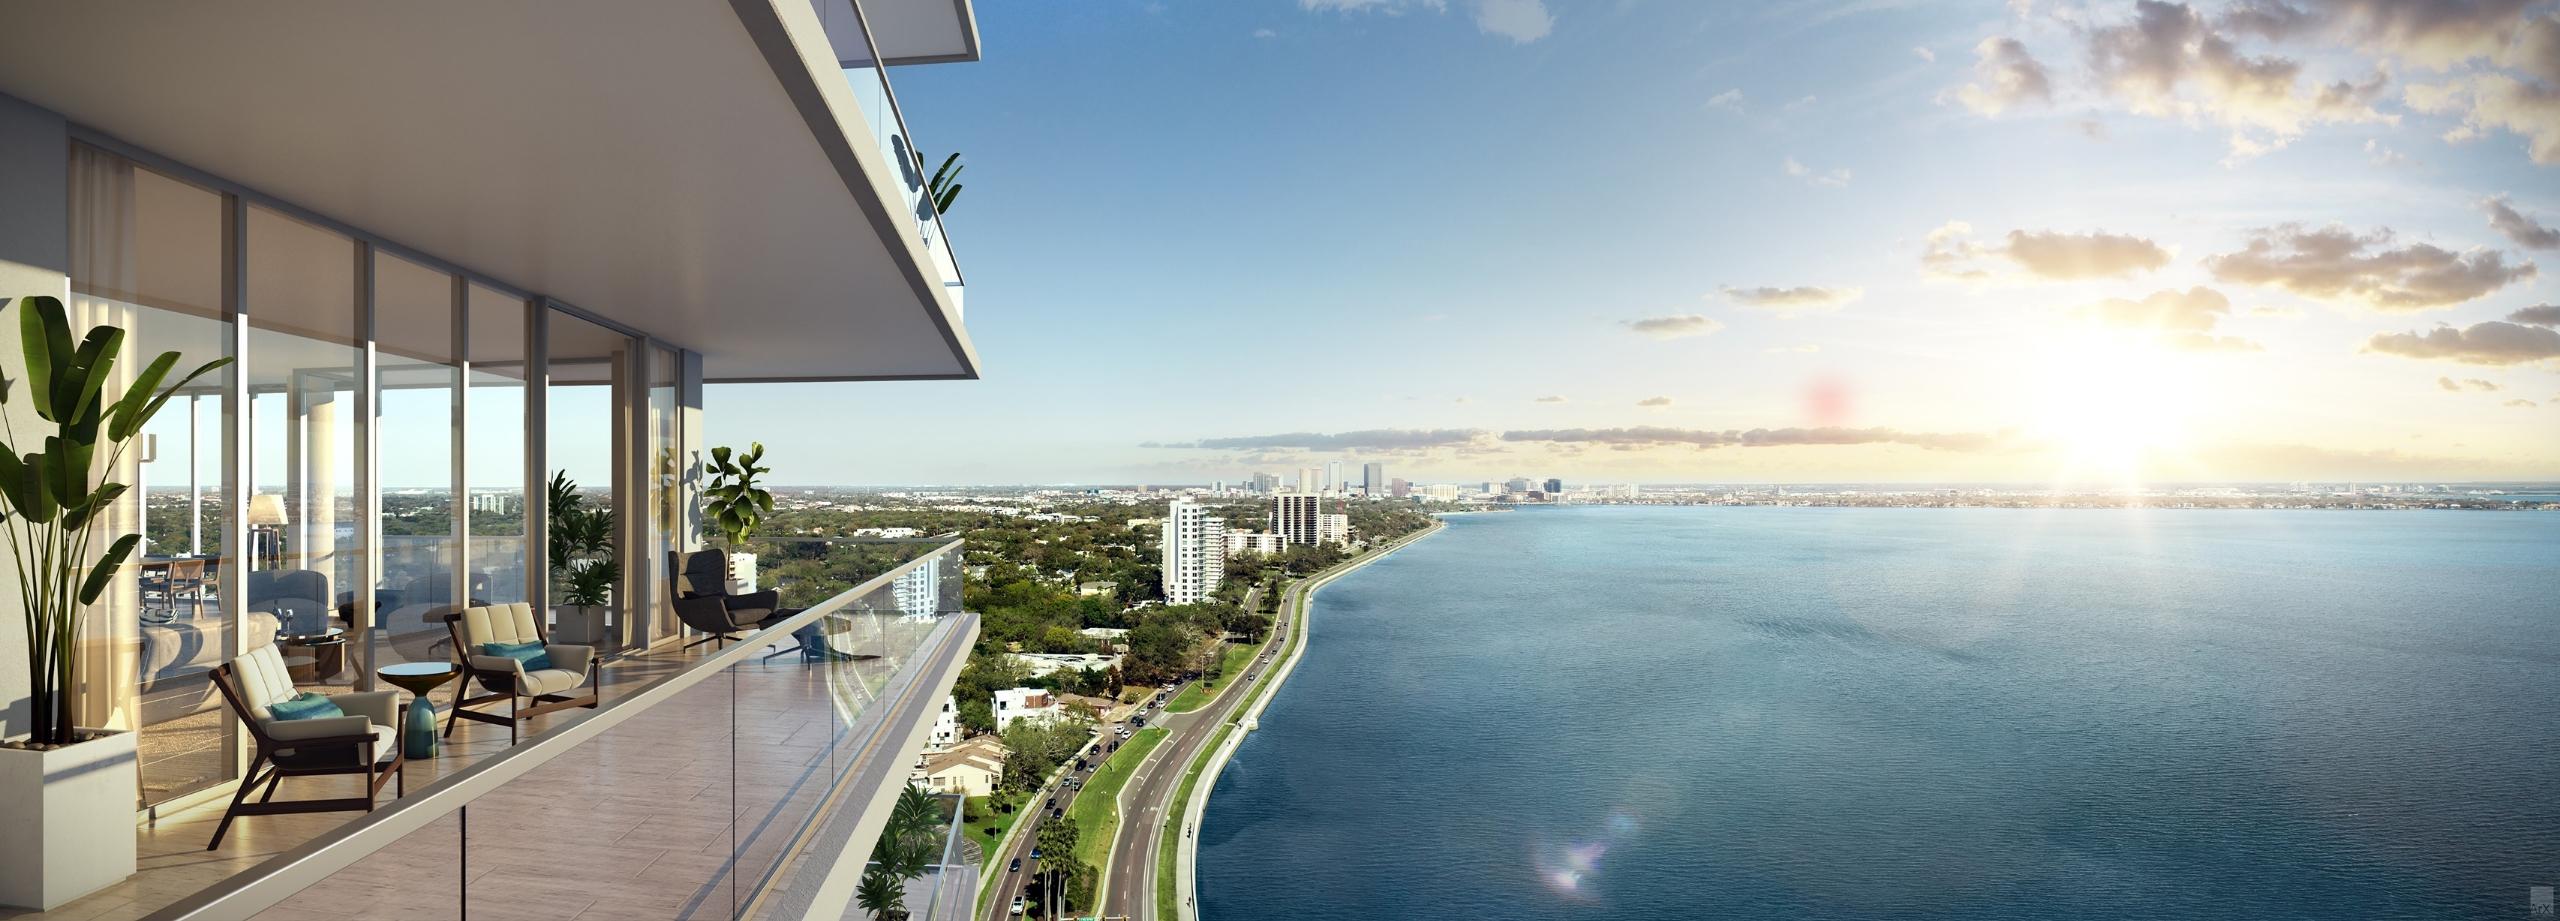 The Ritz-Carlton Residences Tampa (@theresidencestampa) Cover Image